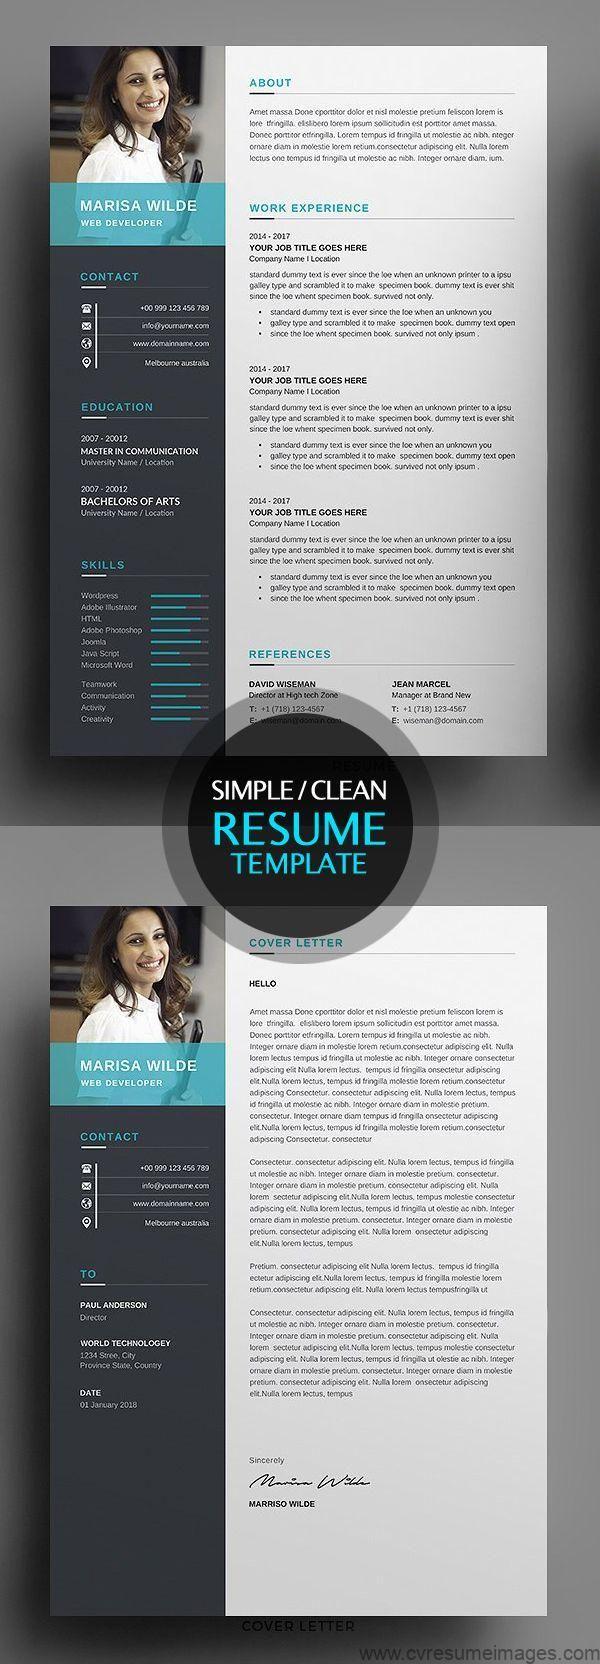 clean resume  cv template 2018  photoshopresume